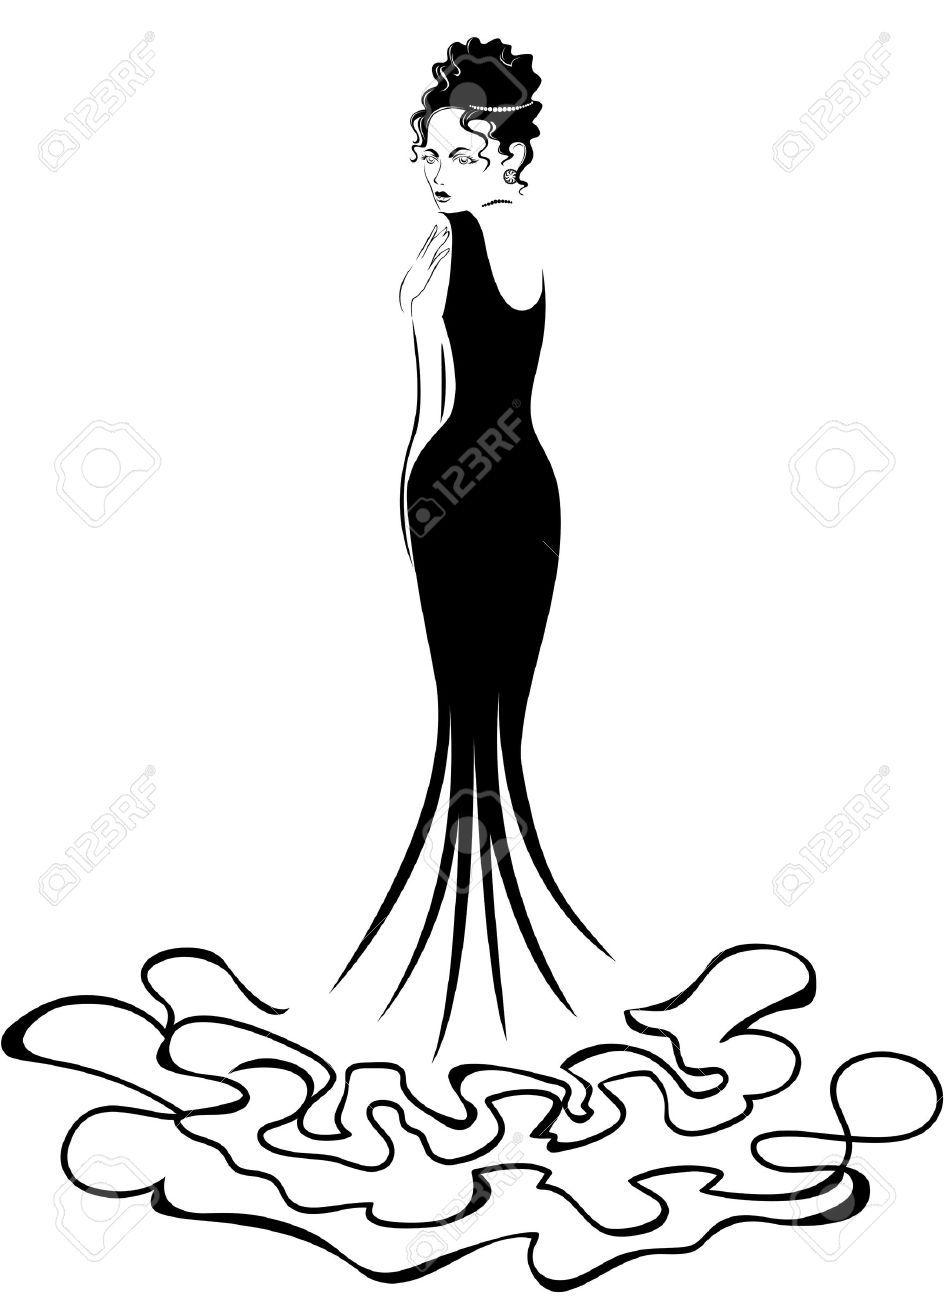 woman elegant silhouette.